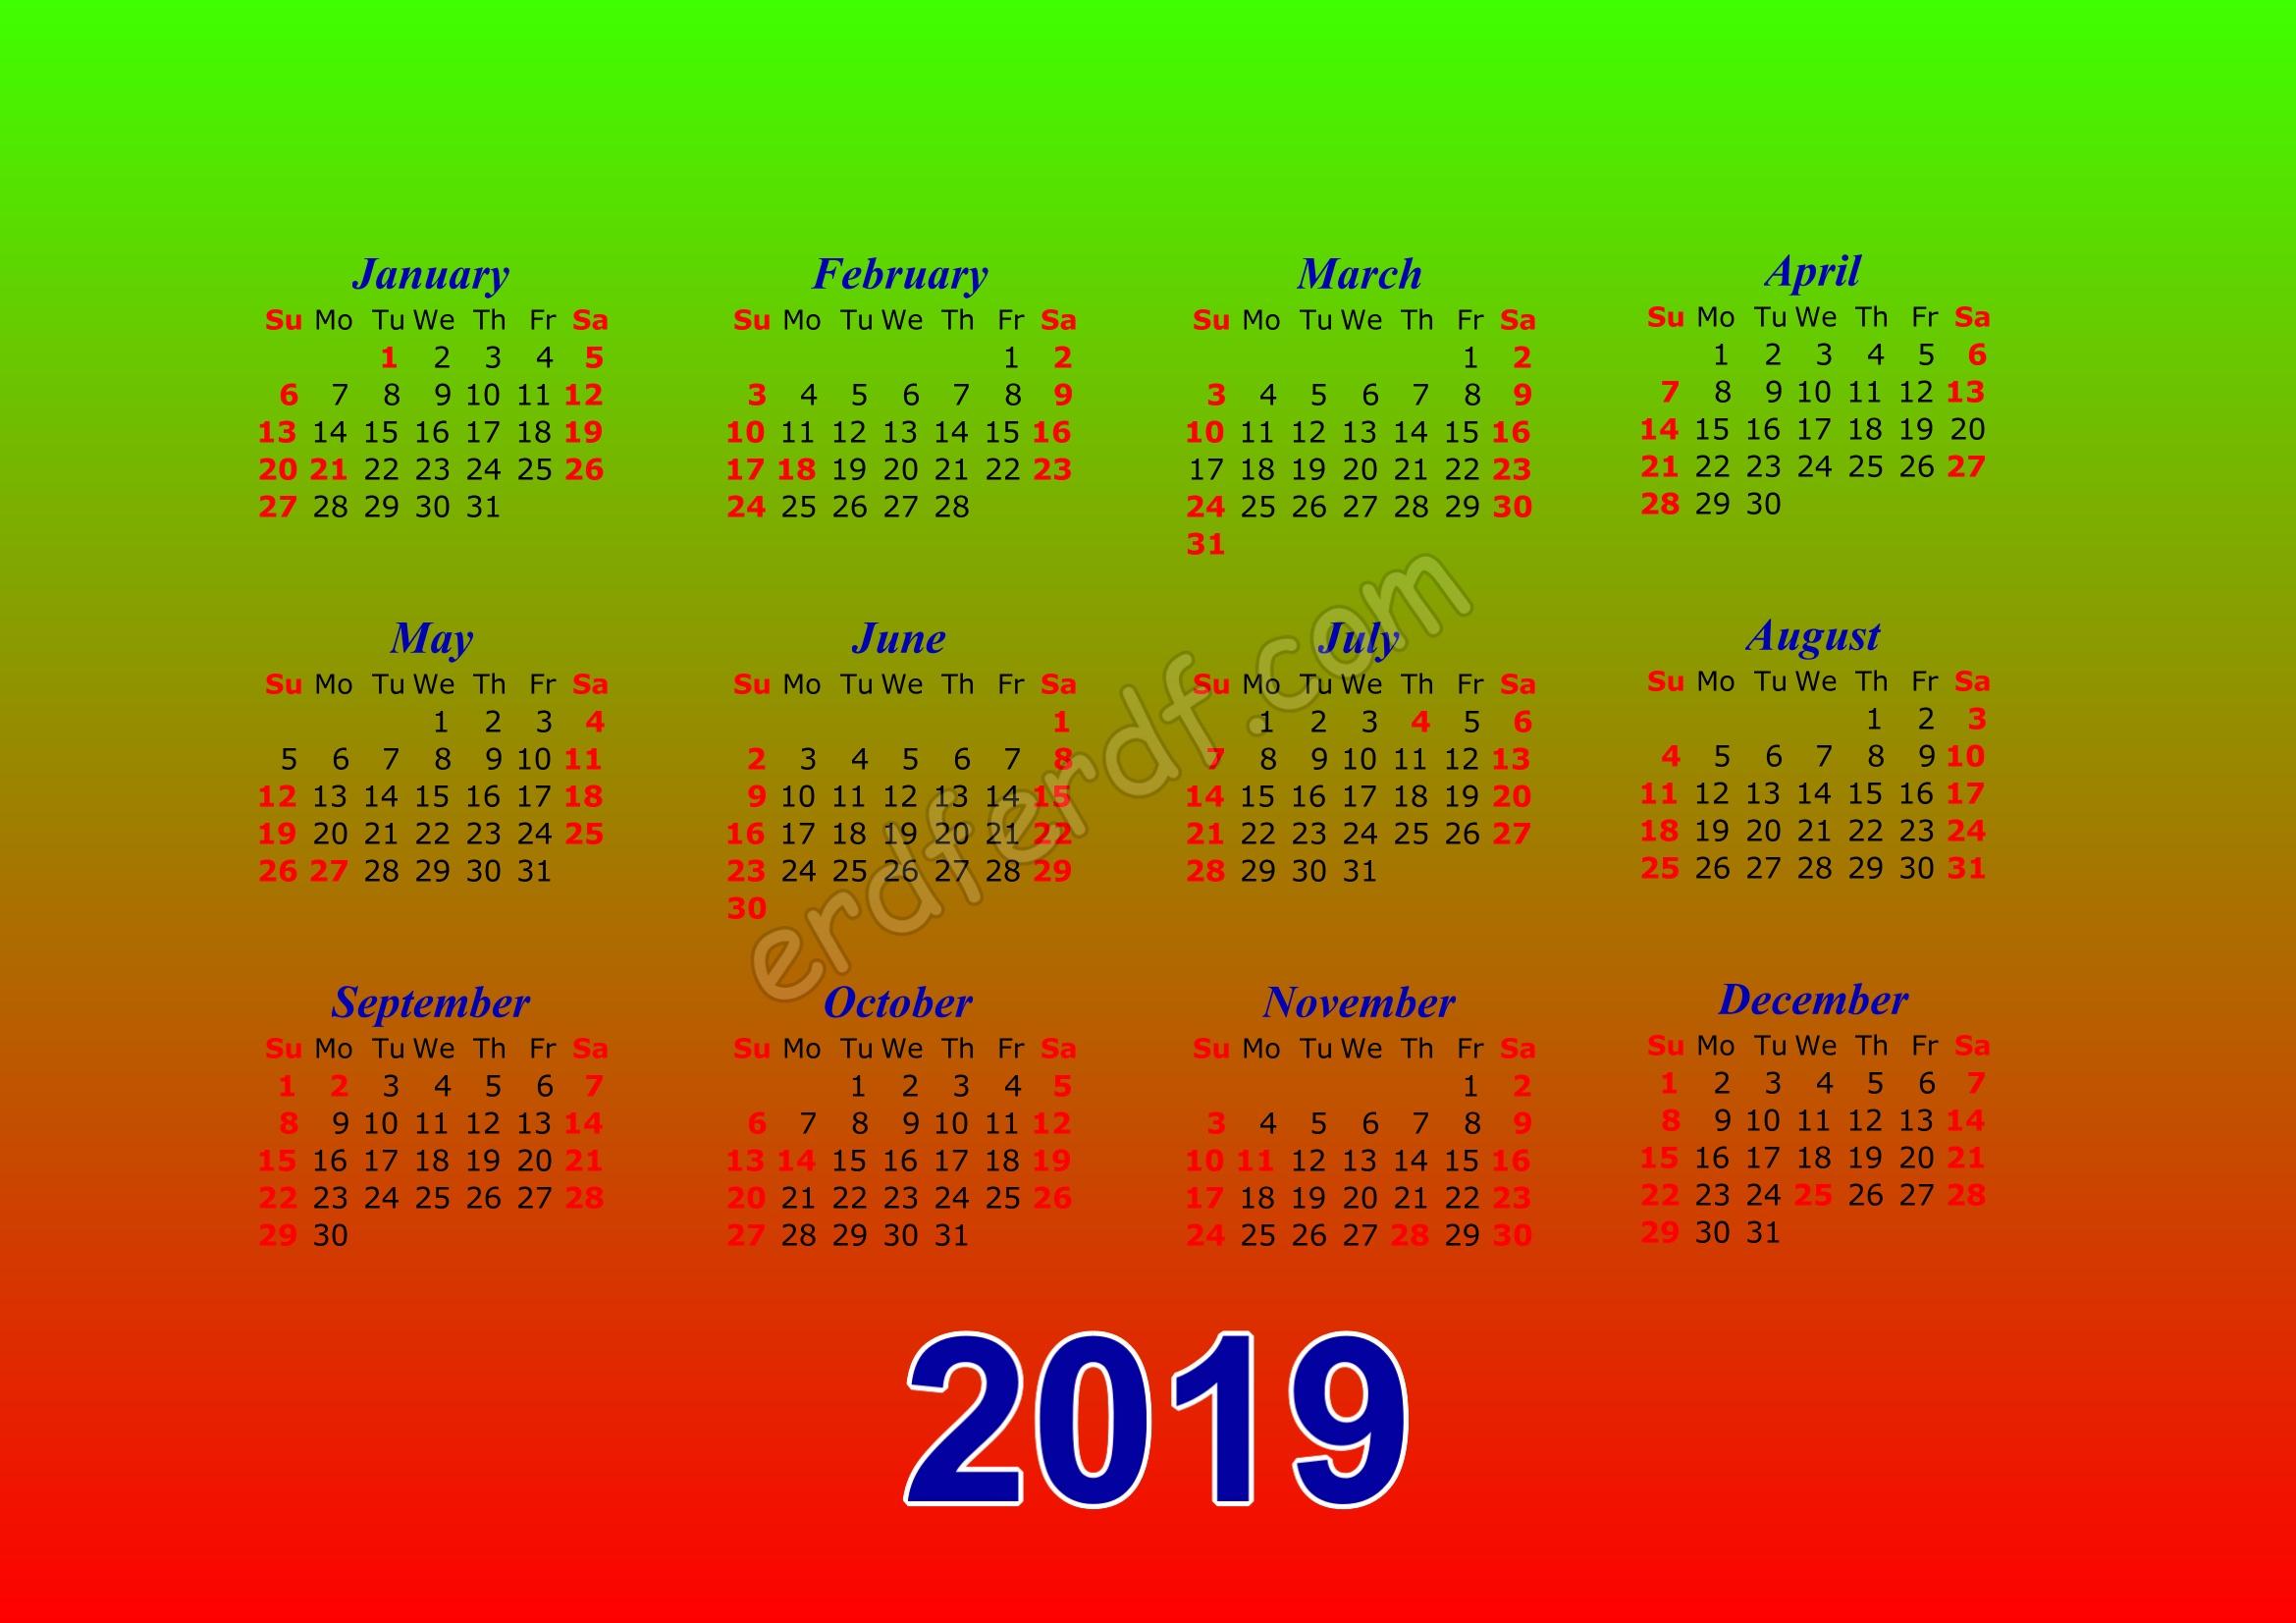 Calendar Template 2019 Illustrator